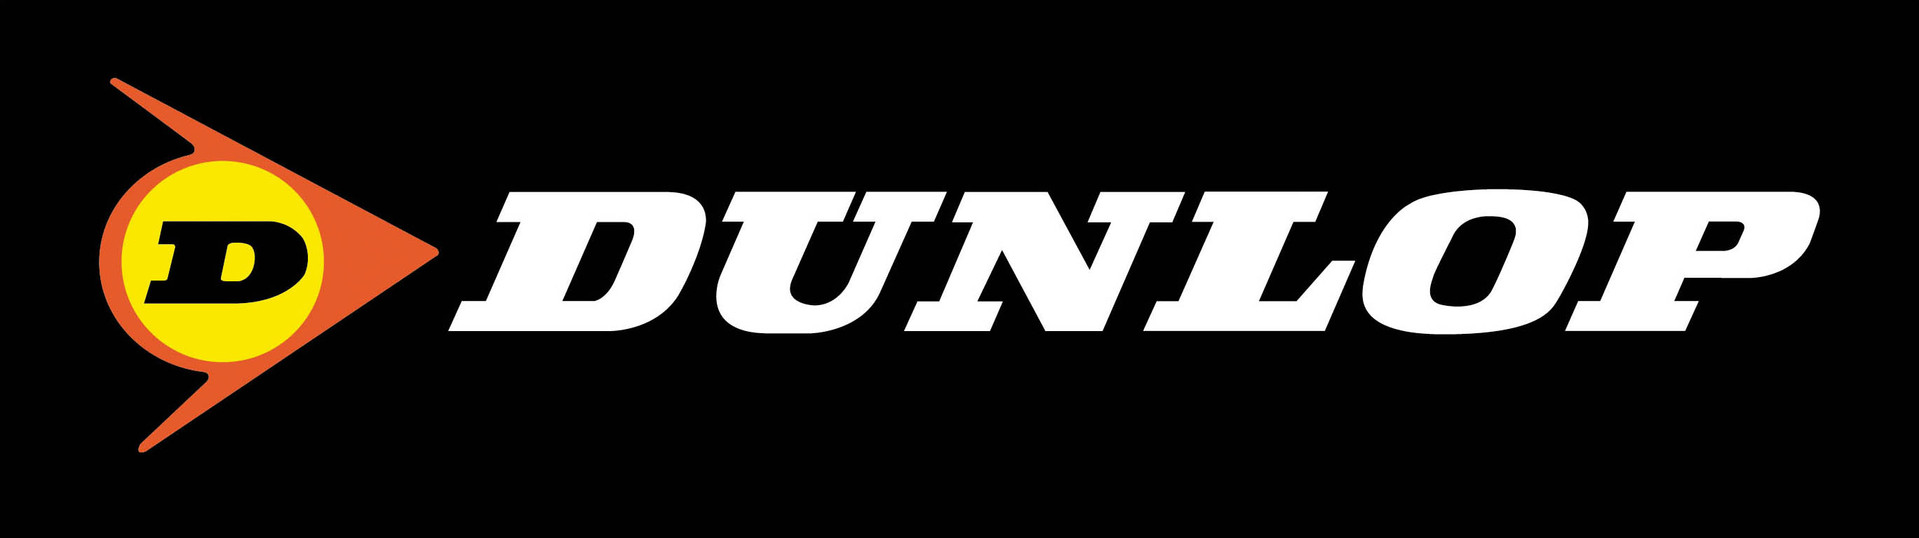 dunlop-tires_coupons.jpg